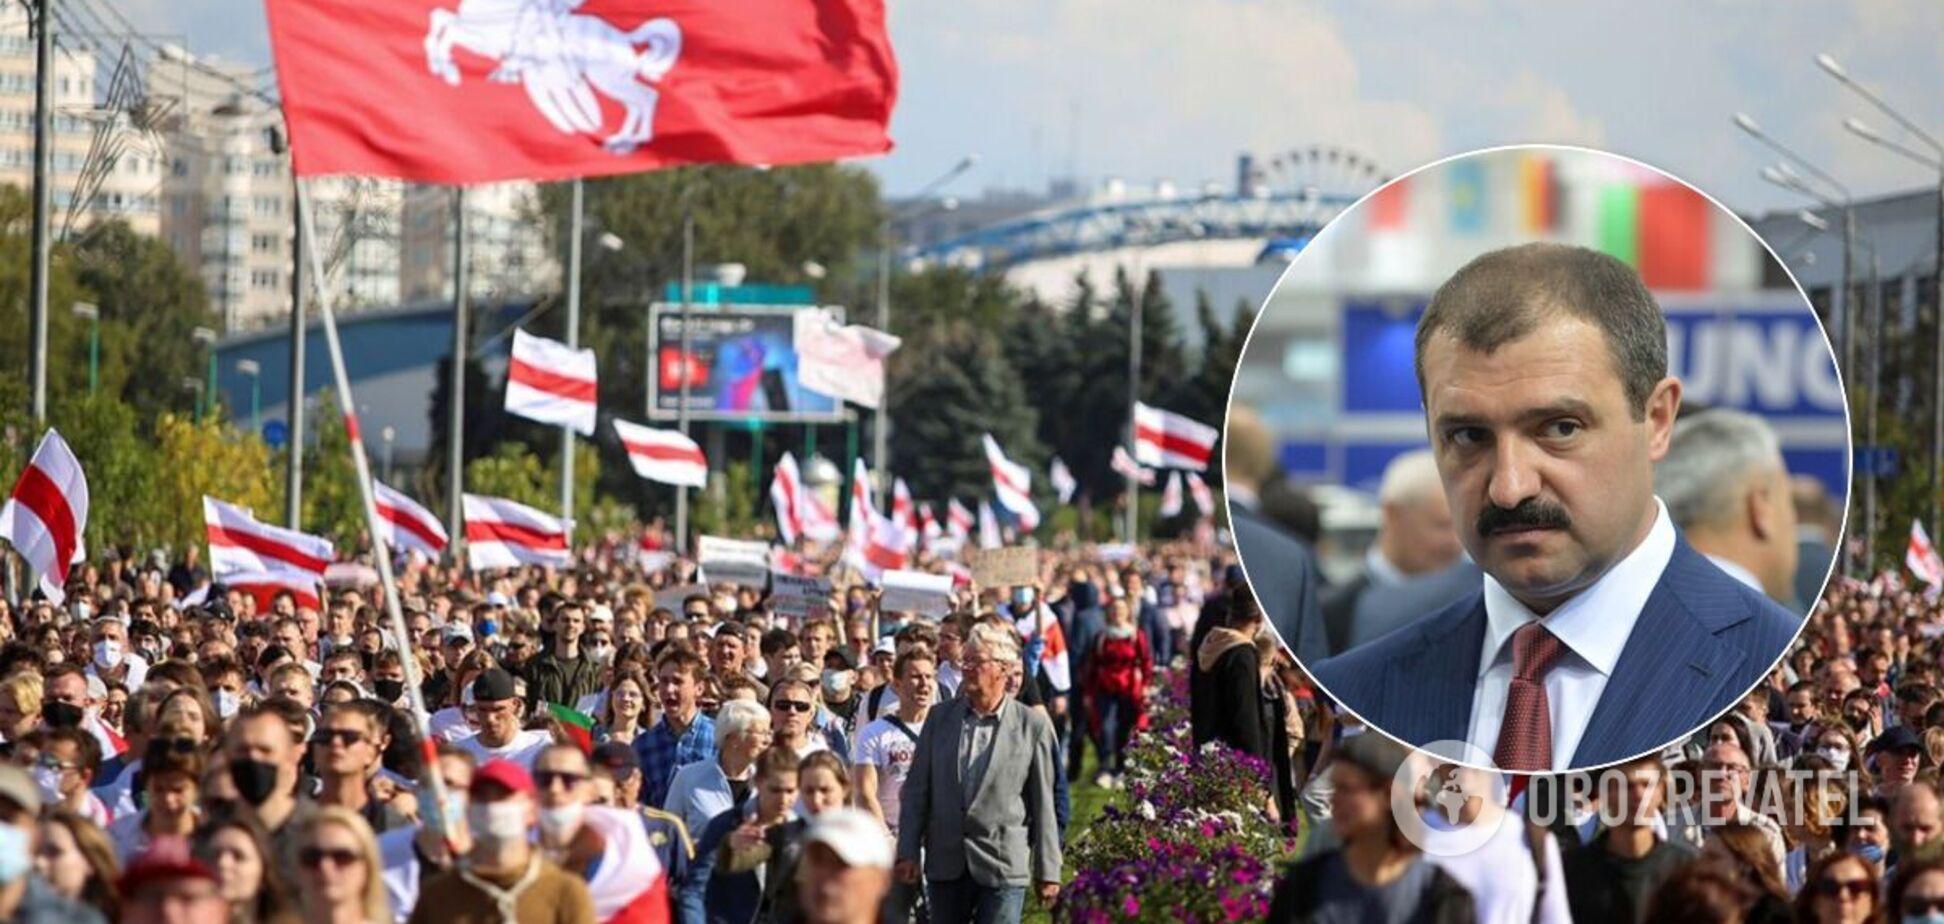 Нам не страшно, – сын Лукашенко высказался о протестах в Беларуси